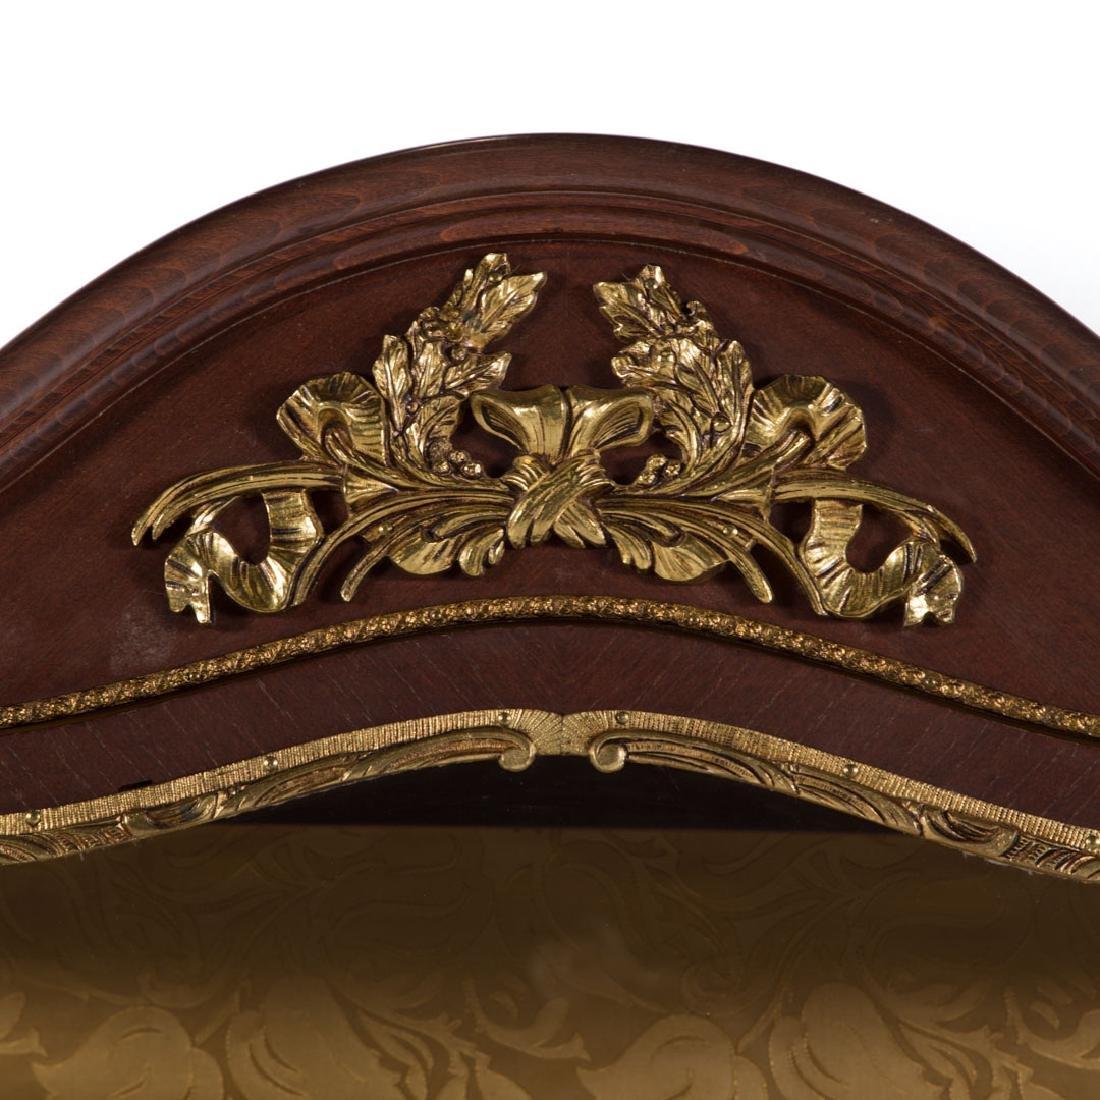 Louis XV inlaid and brass mounted vitrine - 3